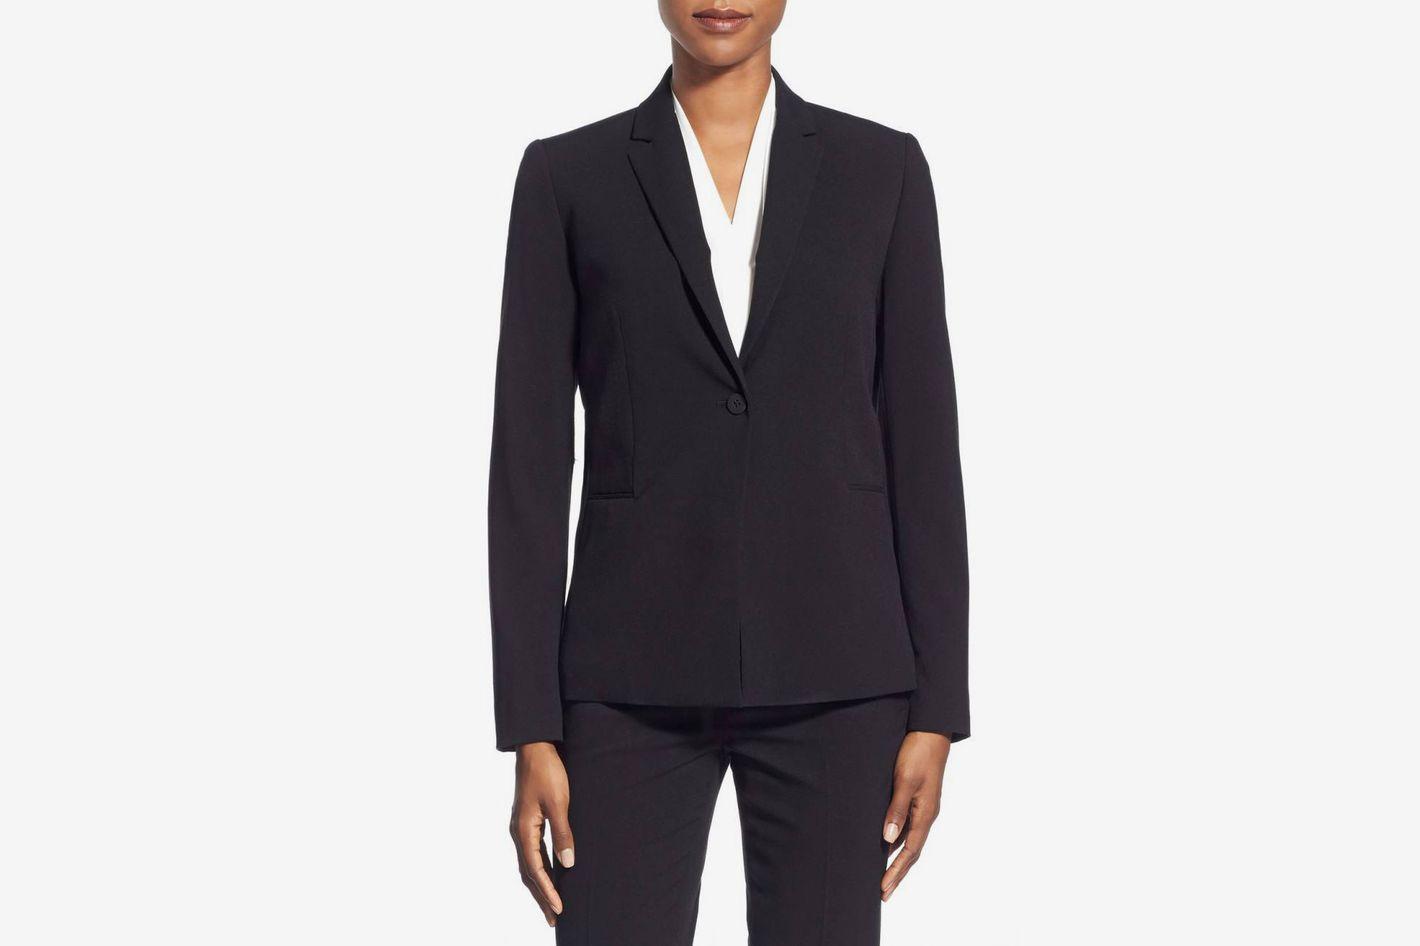 T Tahari Jolie Stretch Woven Suit Jacket